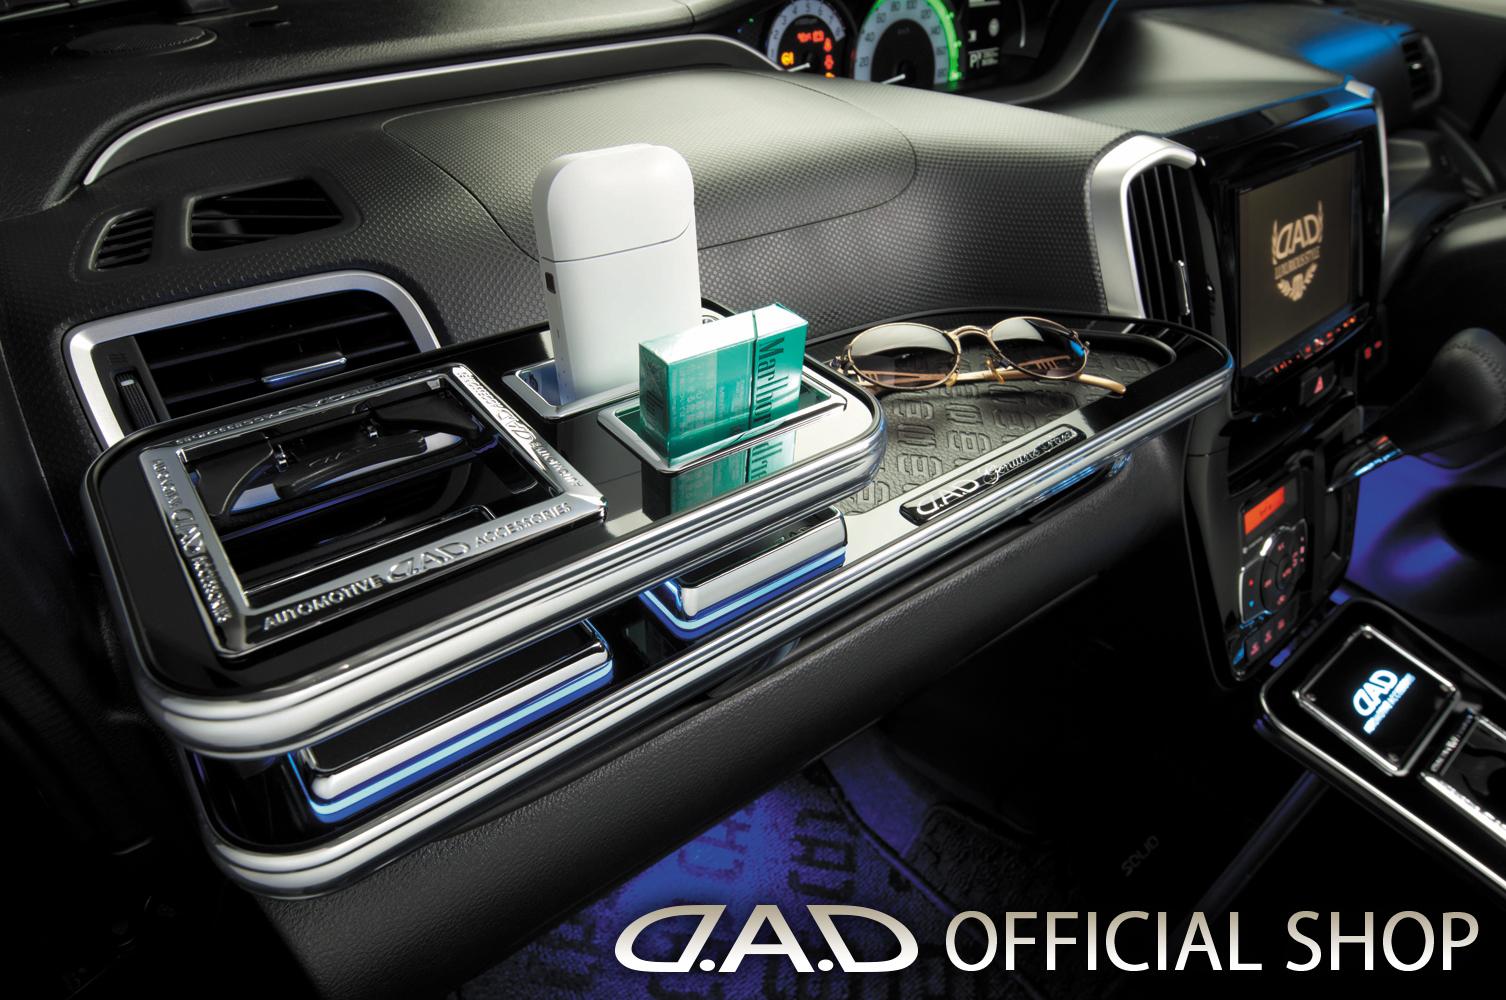 D.A.D フロントテーブル スクエアタイプ トレーデザイン(リーフ/クロコ/ベガ/モノグラム) MA36S/MA46S ソリオバンディット GARSON ギャルソン DAD